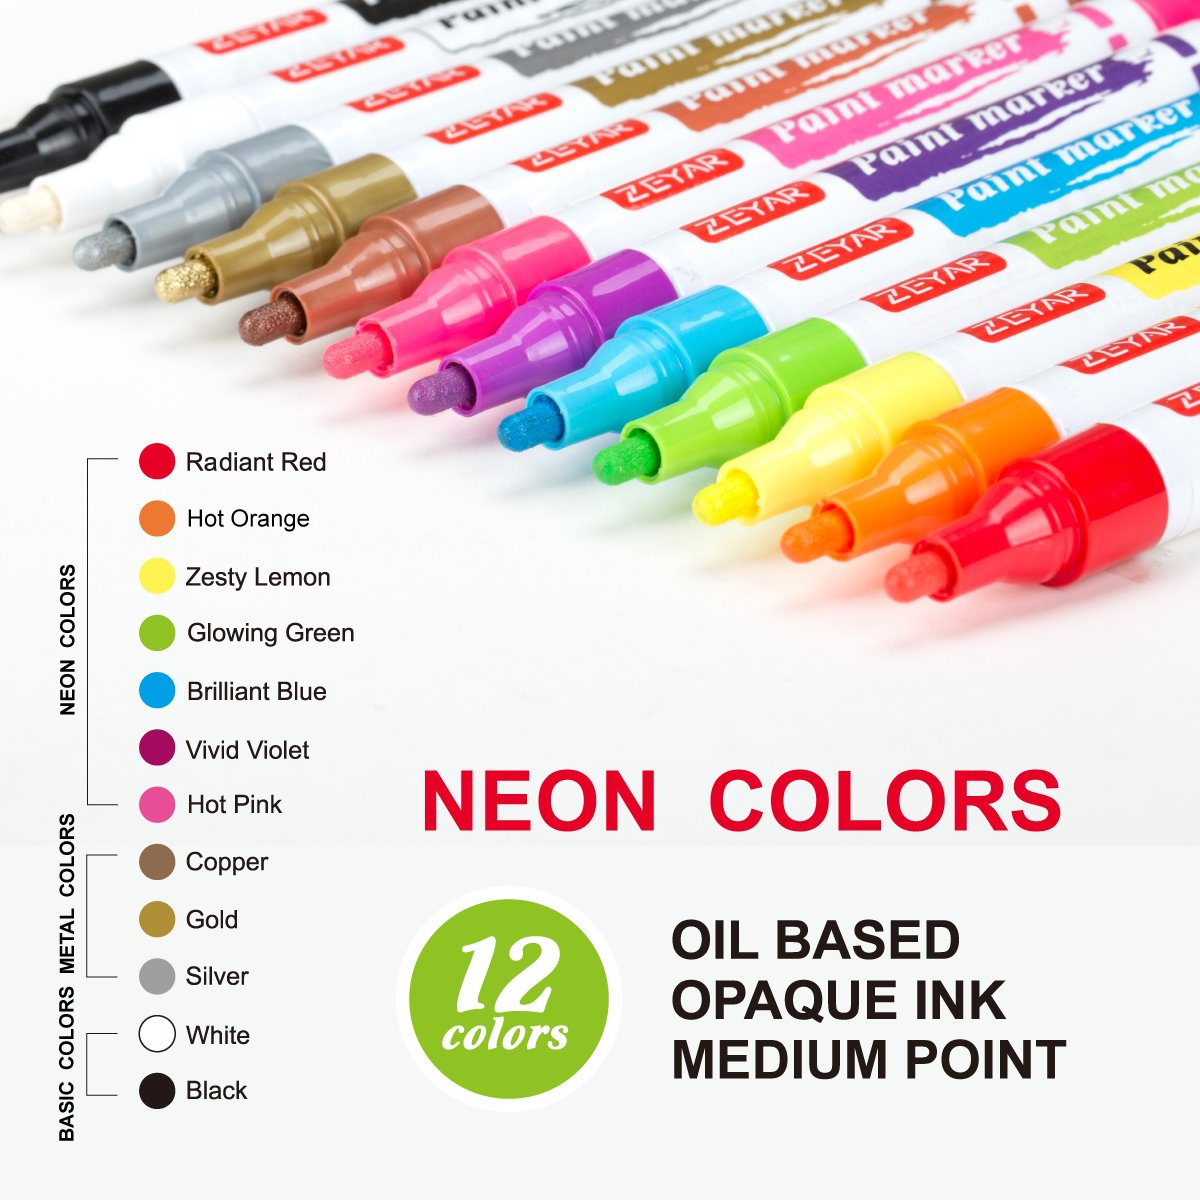 ZEYAR Paint Pens, Oil-Based, Medium Point,12 Metallic and Neon Colors, Odorless, Expert of Rock Painting, Xylene Free, Metal Penholder, Professional Paint Marker Manufacturer